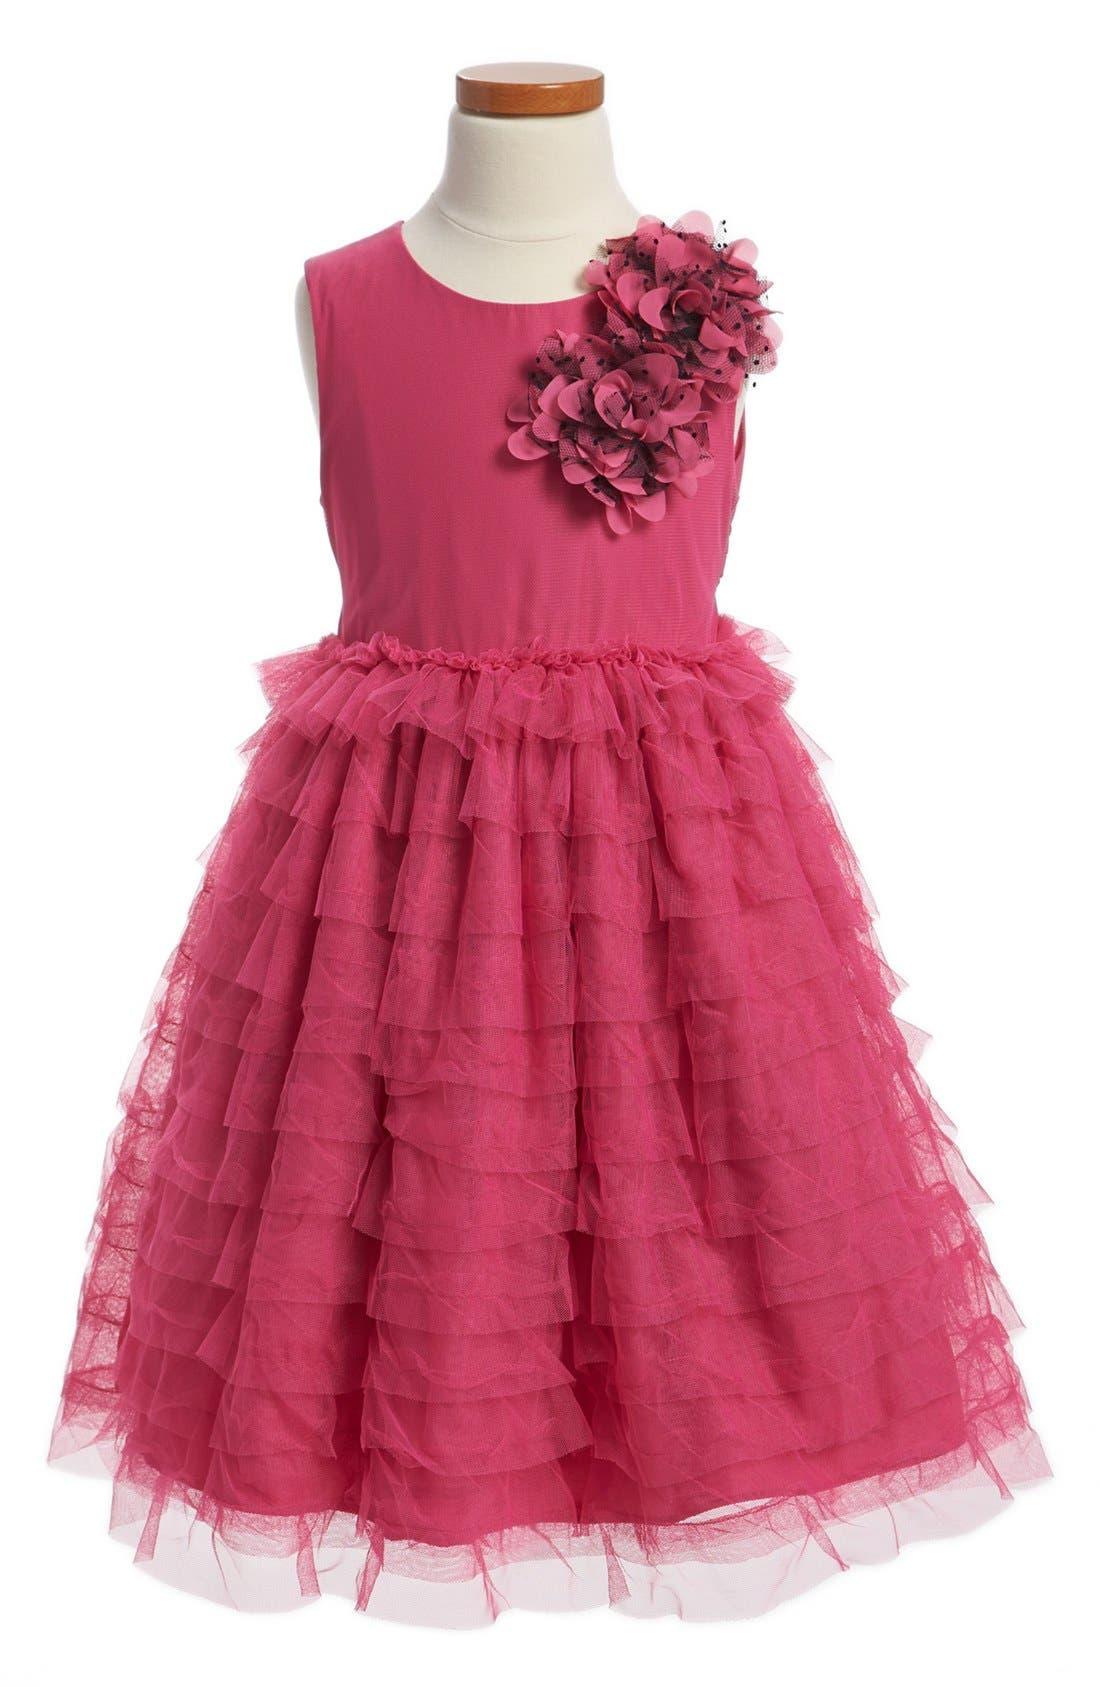 Main Image - Pippa & Julie Ruffle Tulle Dress (Little Girls & Big Girls)